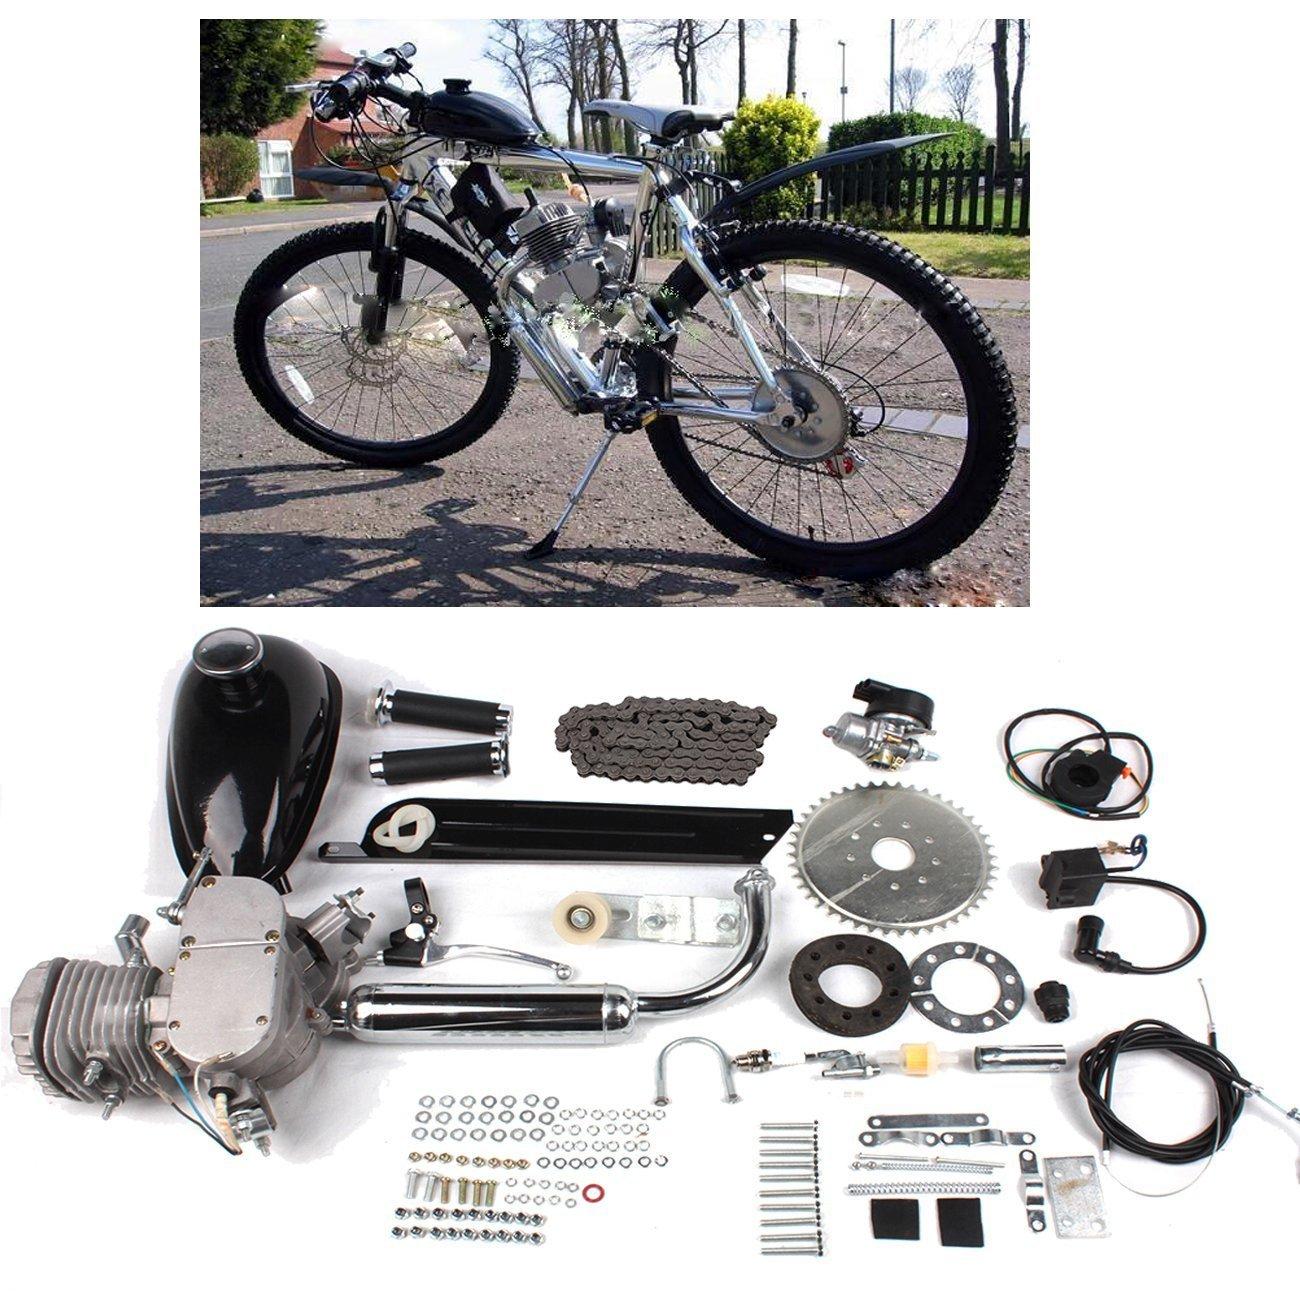 RayWax Motorizado Bicicleta 80CC Kit, 2 Trazo Kit de Motor de Bicicleta, Motor y Gasolina de Ciclo de Pedal de Bicicleta Motorizada/Eléctrica, ...